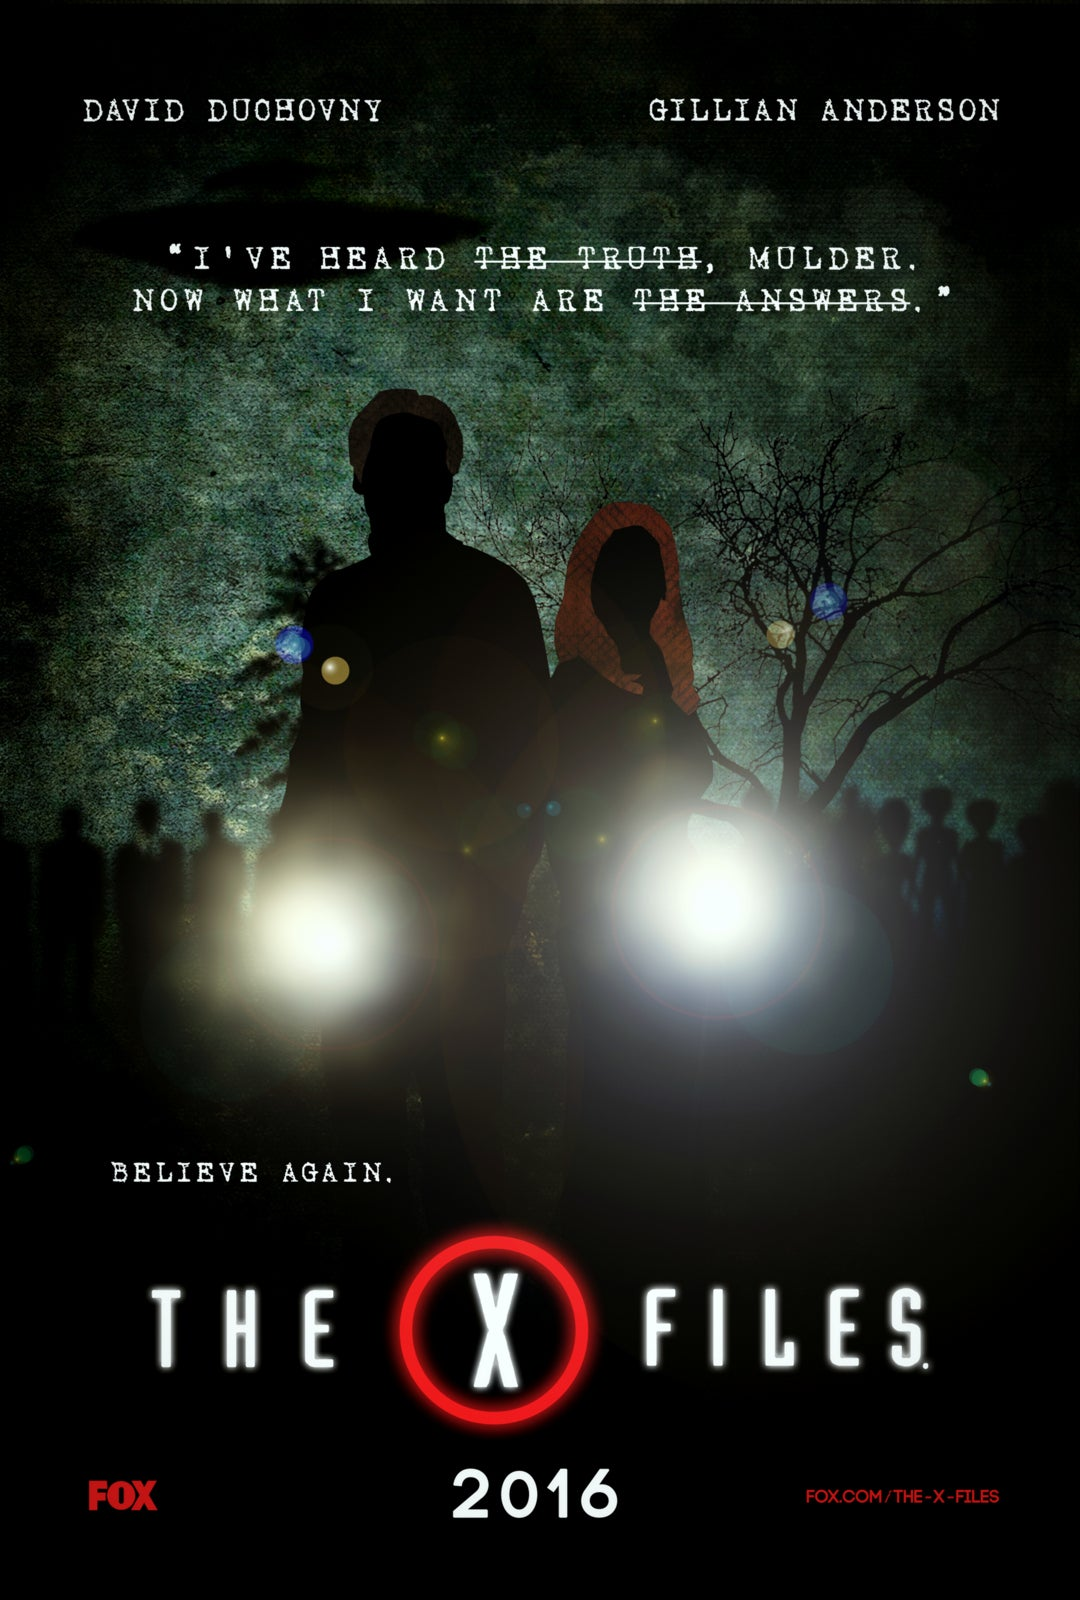 The HFPA Investigates X Files